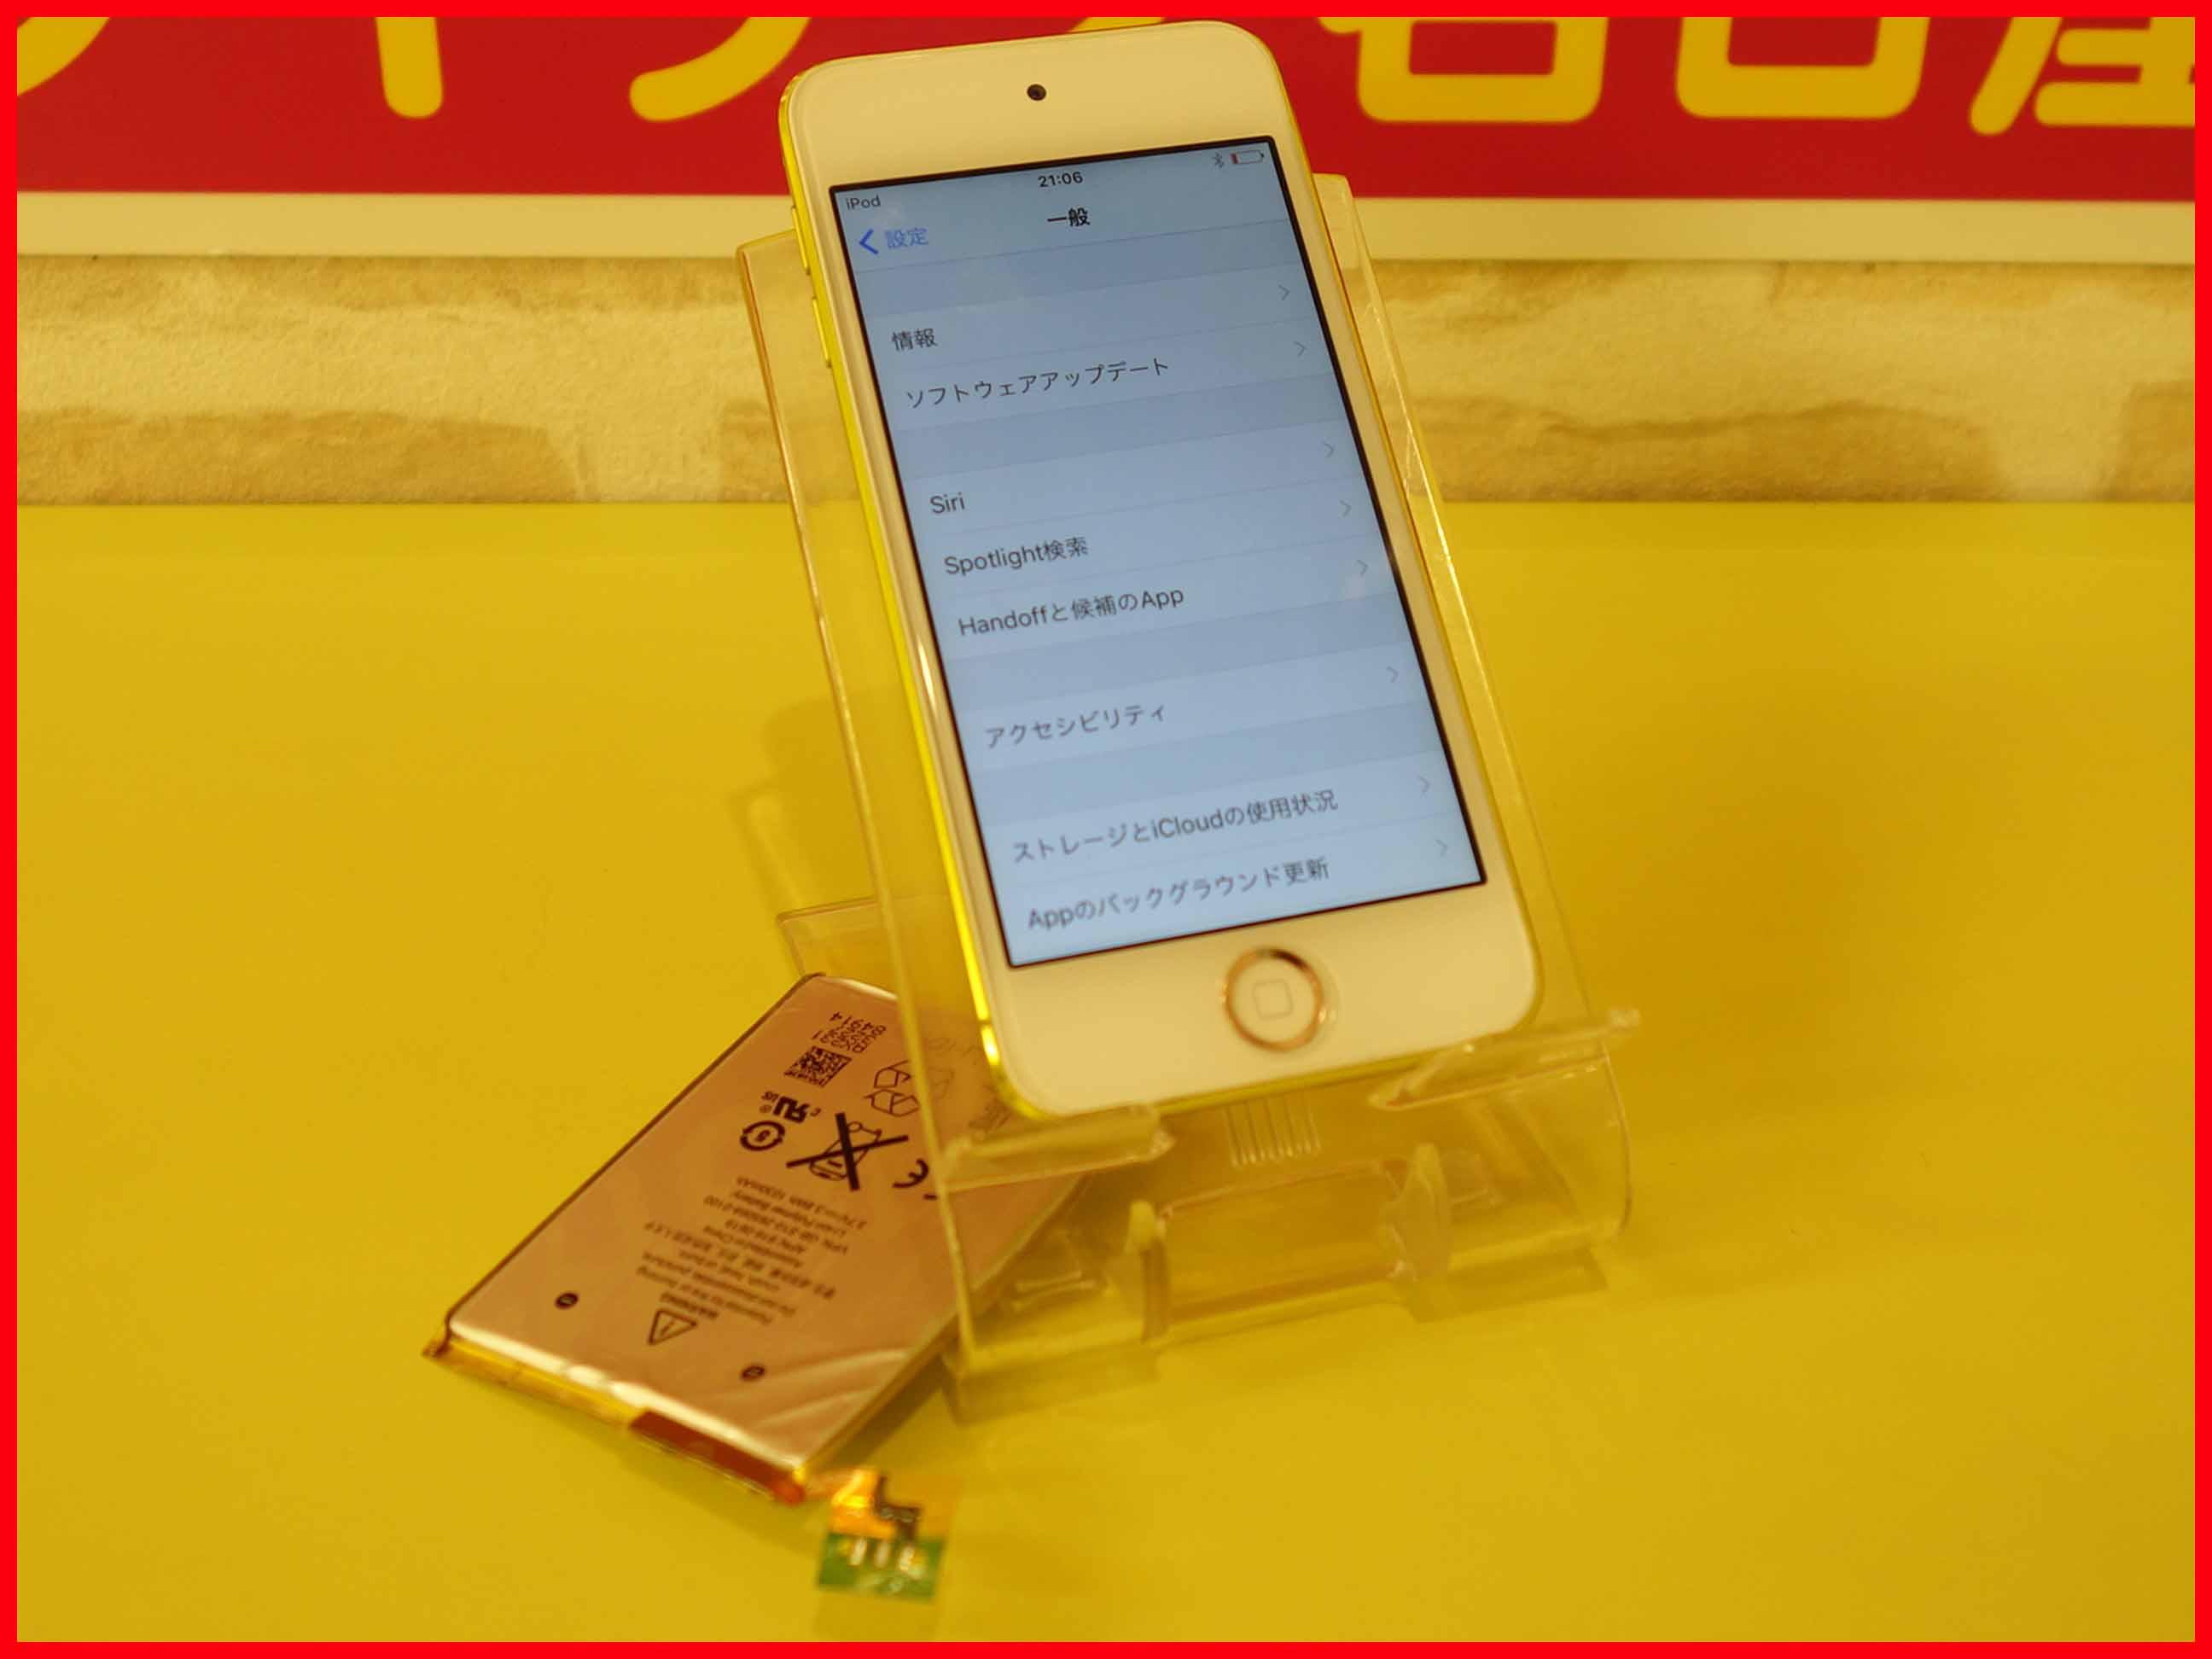 iPod Touch5のバッテリー交換修理 名古屋市内からご来店!アイポッド修理もクイック名古屋